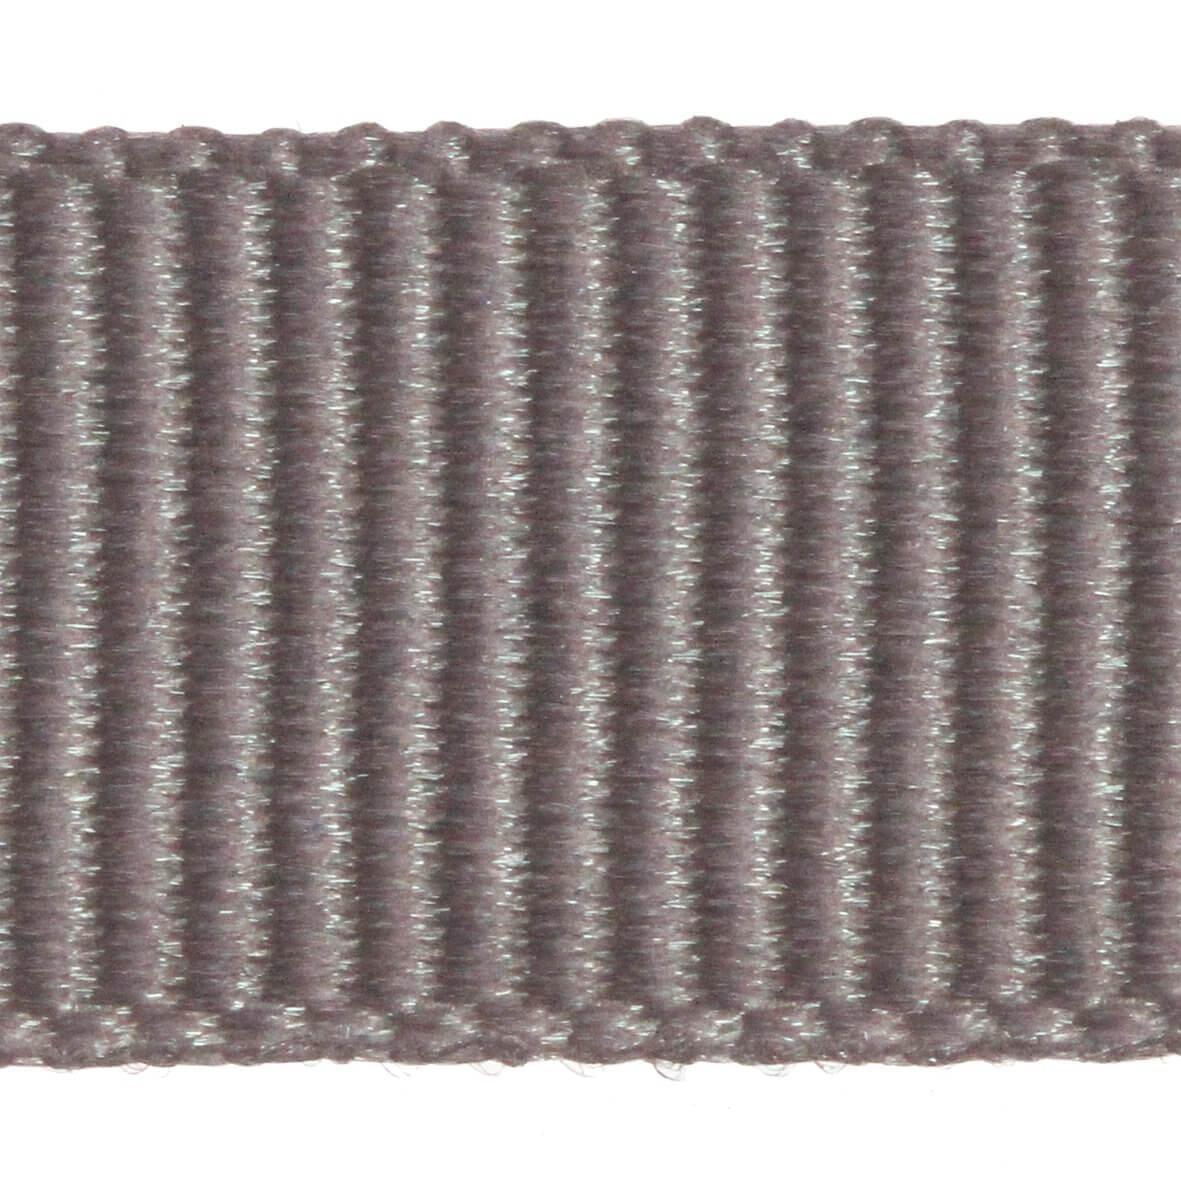 Berisfords Grosgrain 6mm Ribbon - Grey Colour 9704 - Zoom